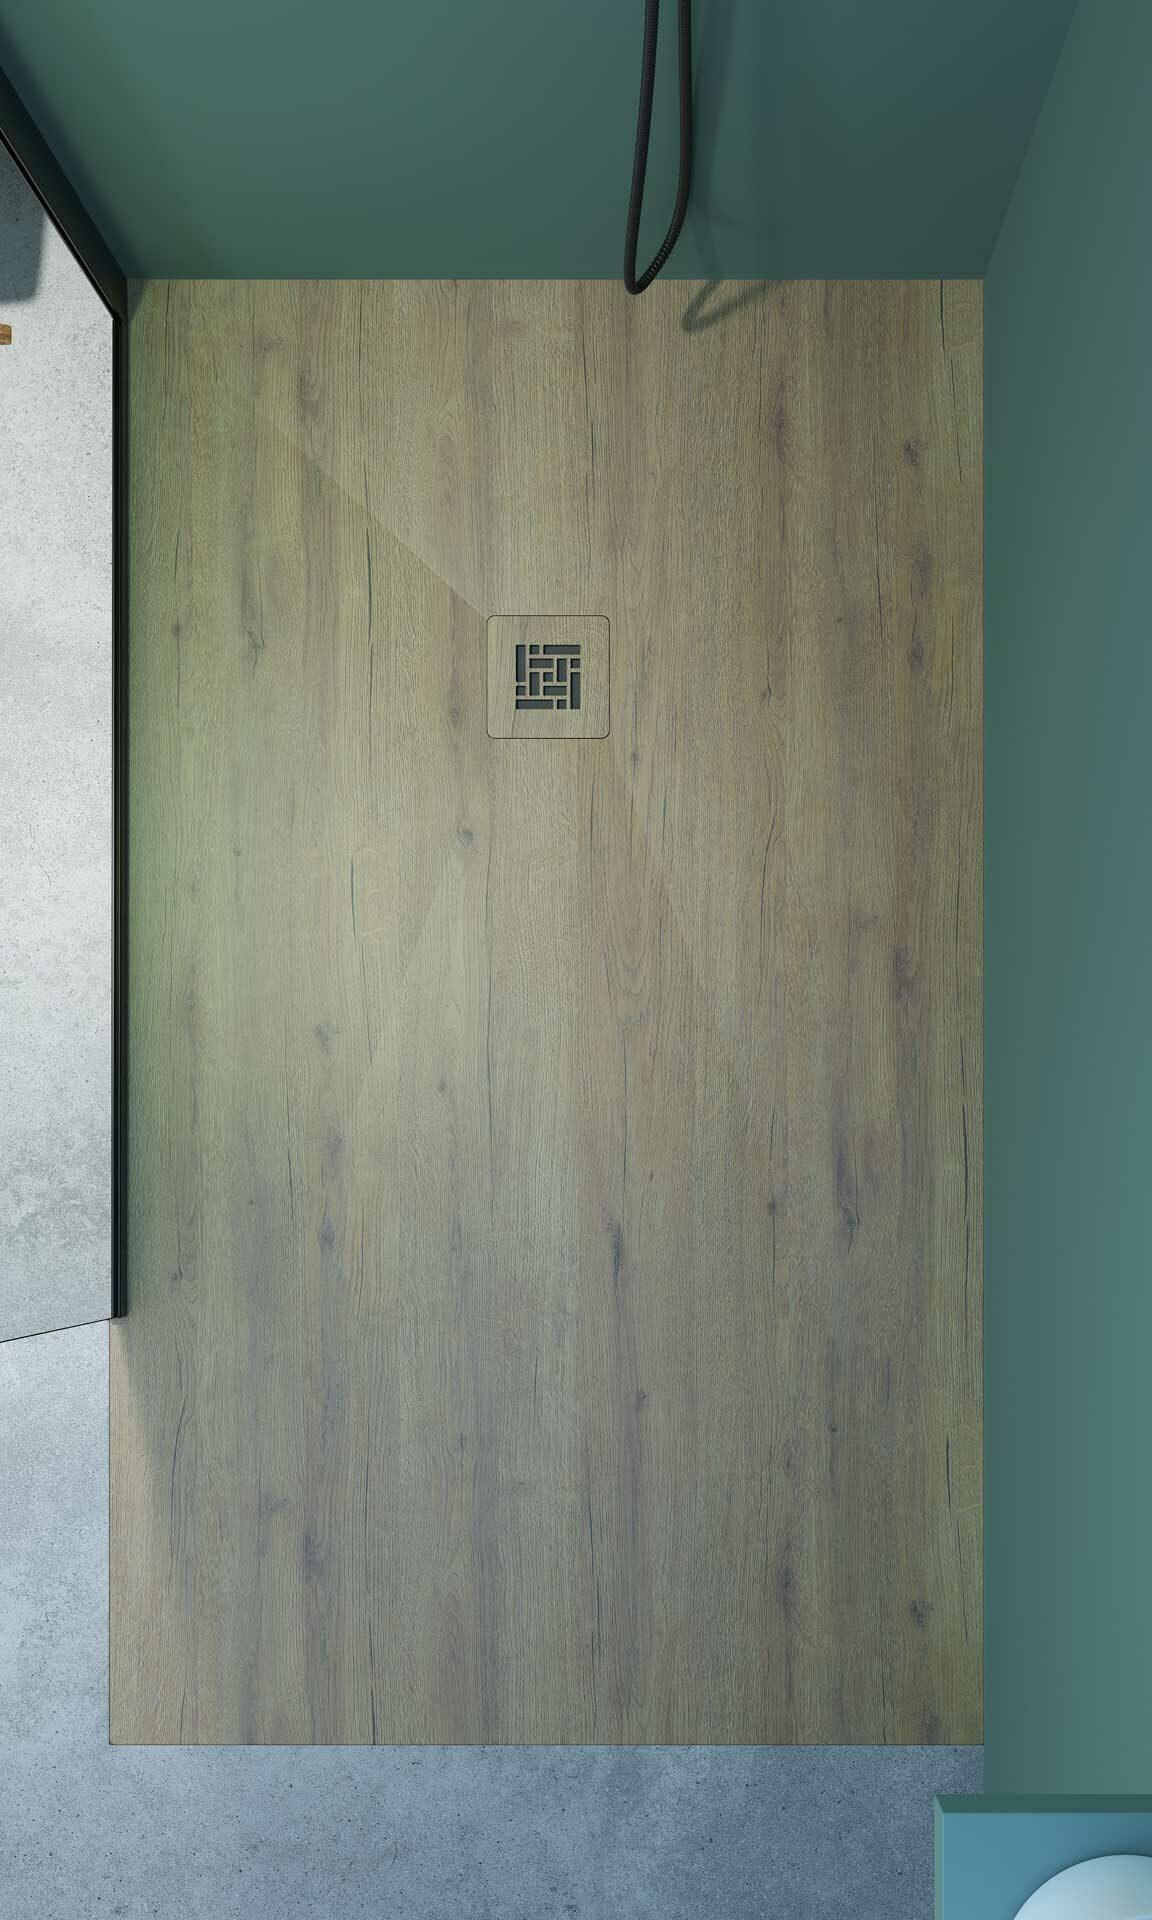 Plato de ducha resina Akasha Génova efecto madera